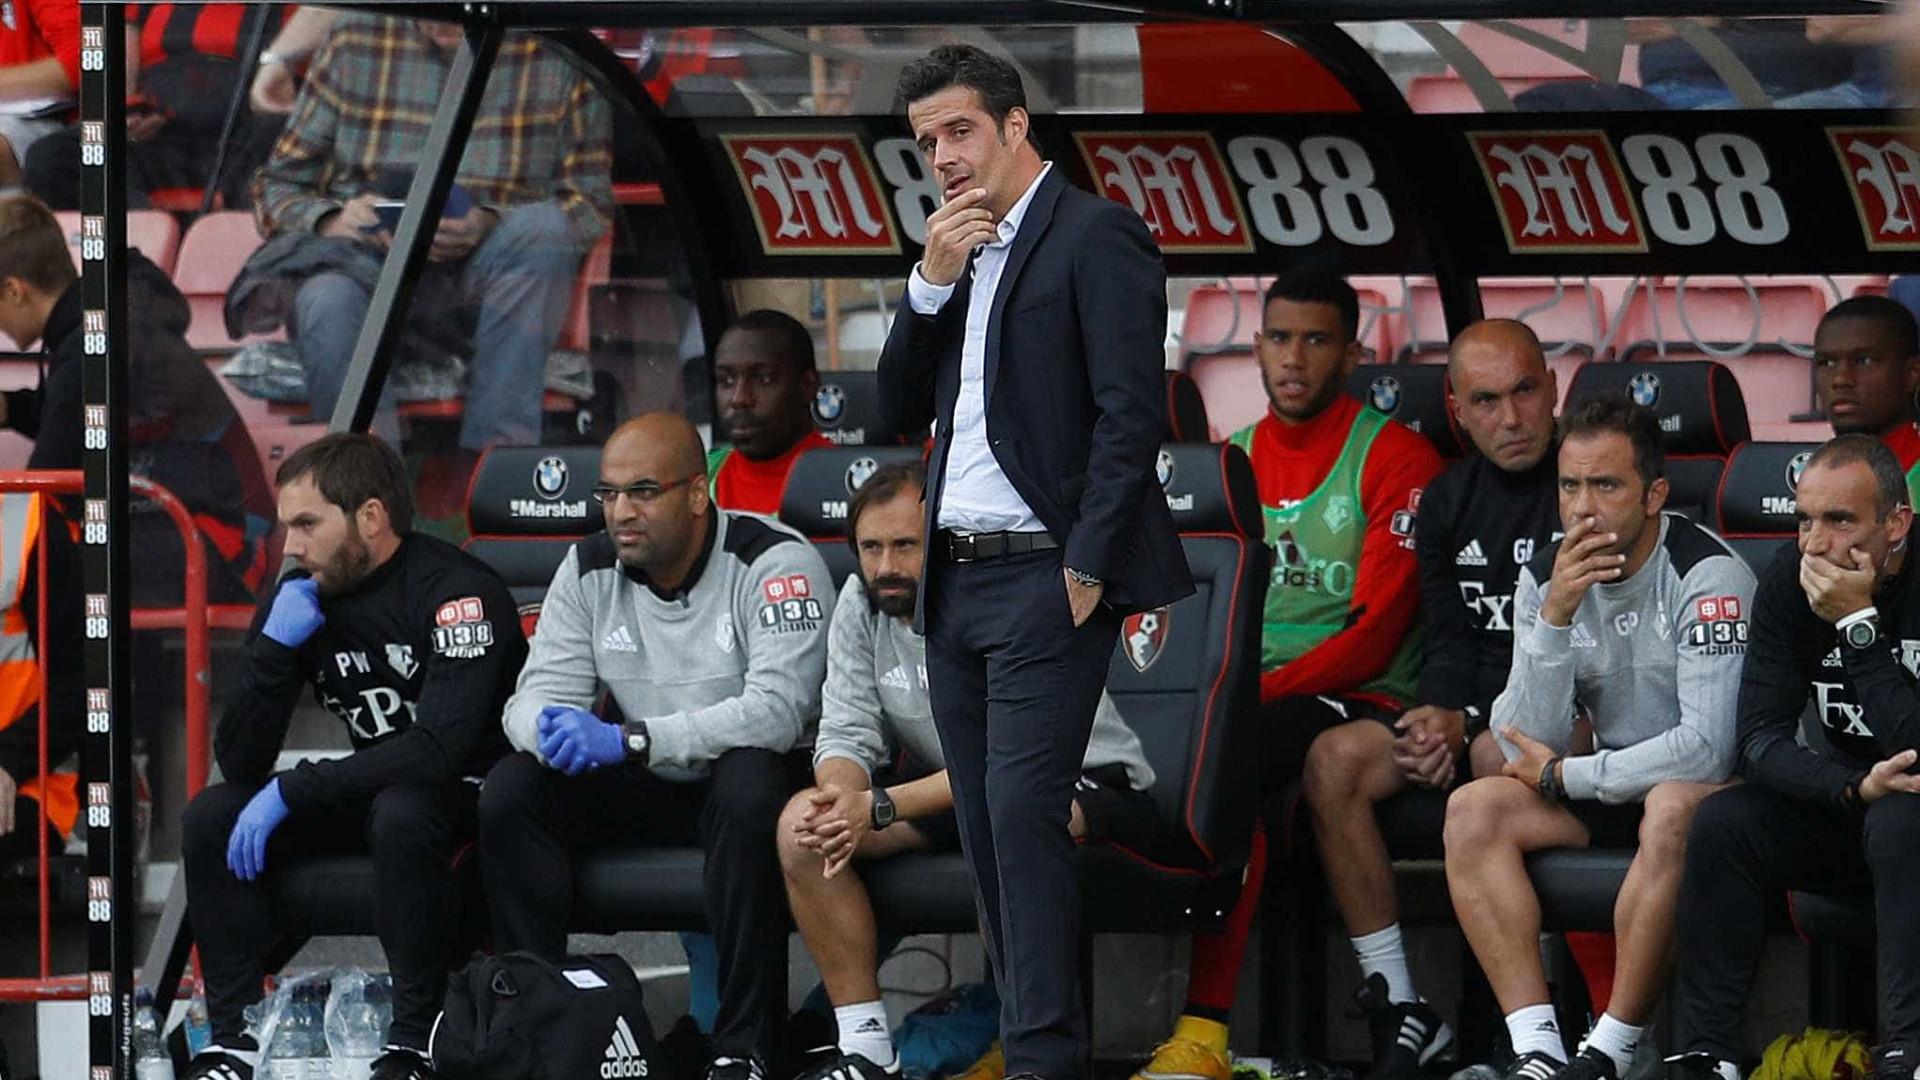 Watford de Marco Silva empata com o Brighton na estreia de Carrillo